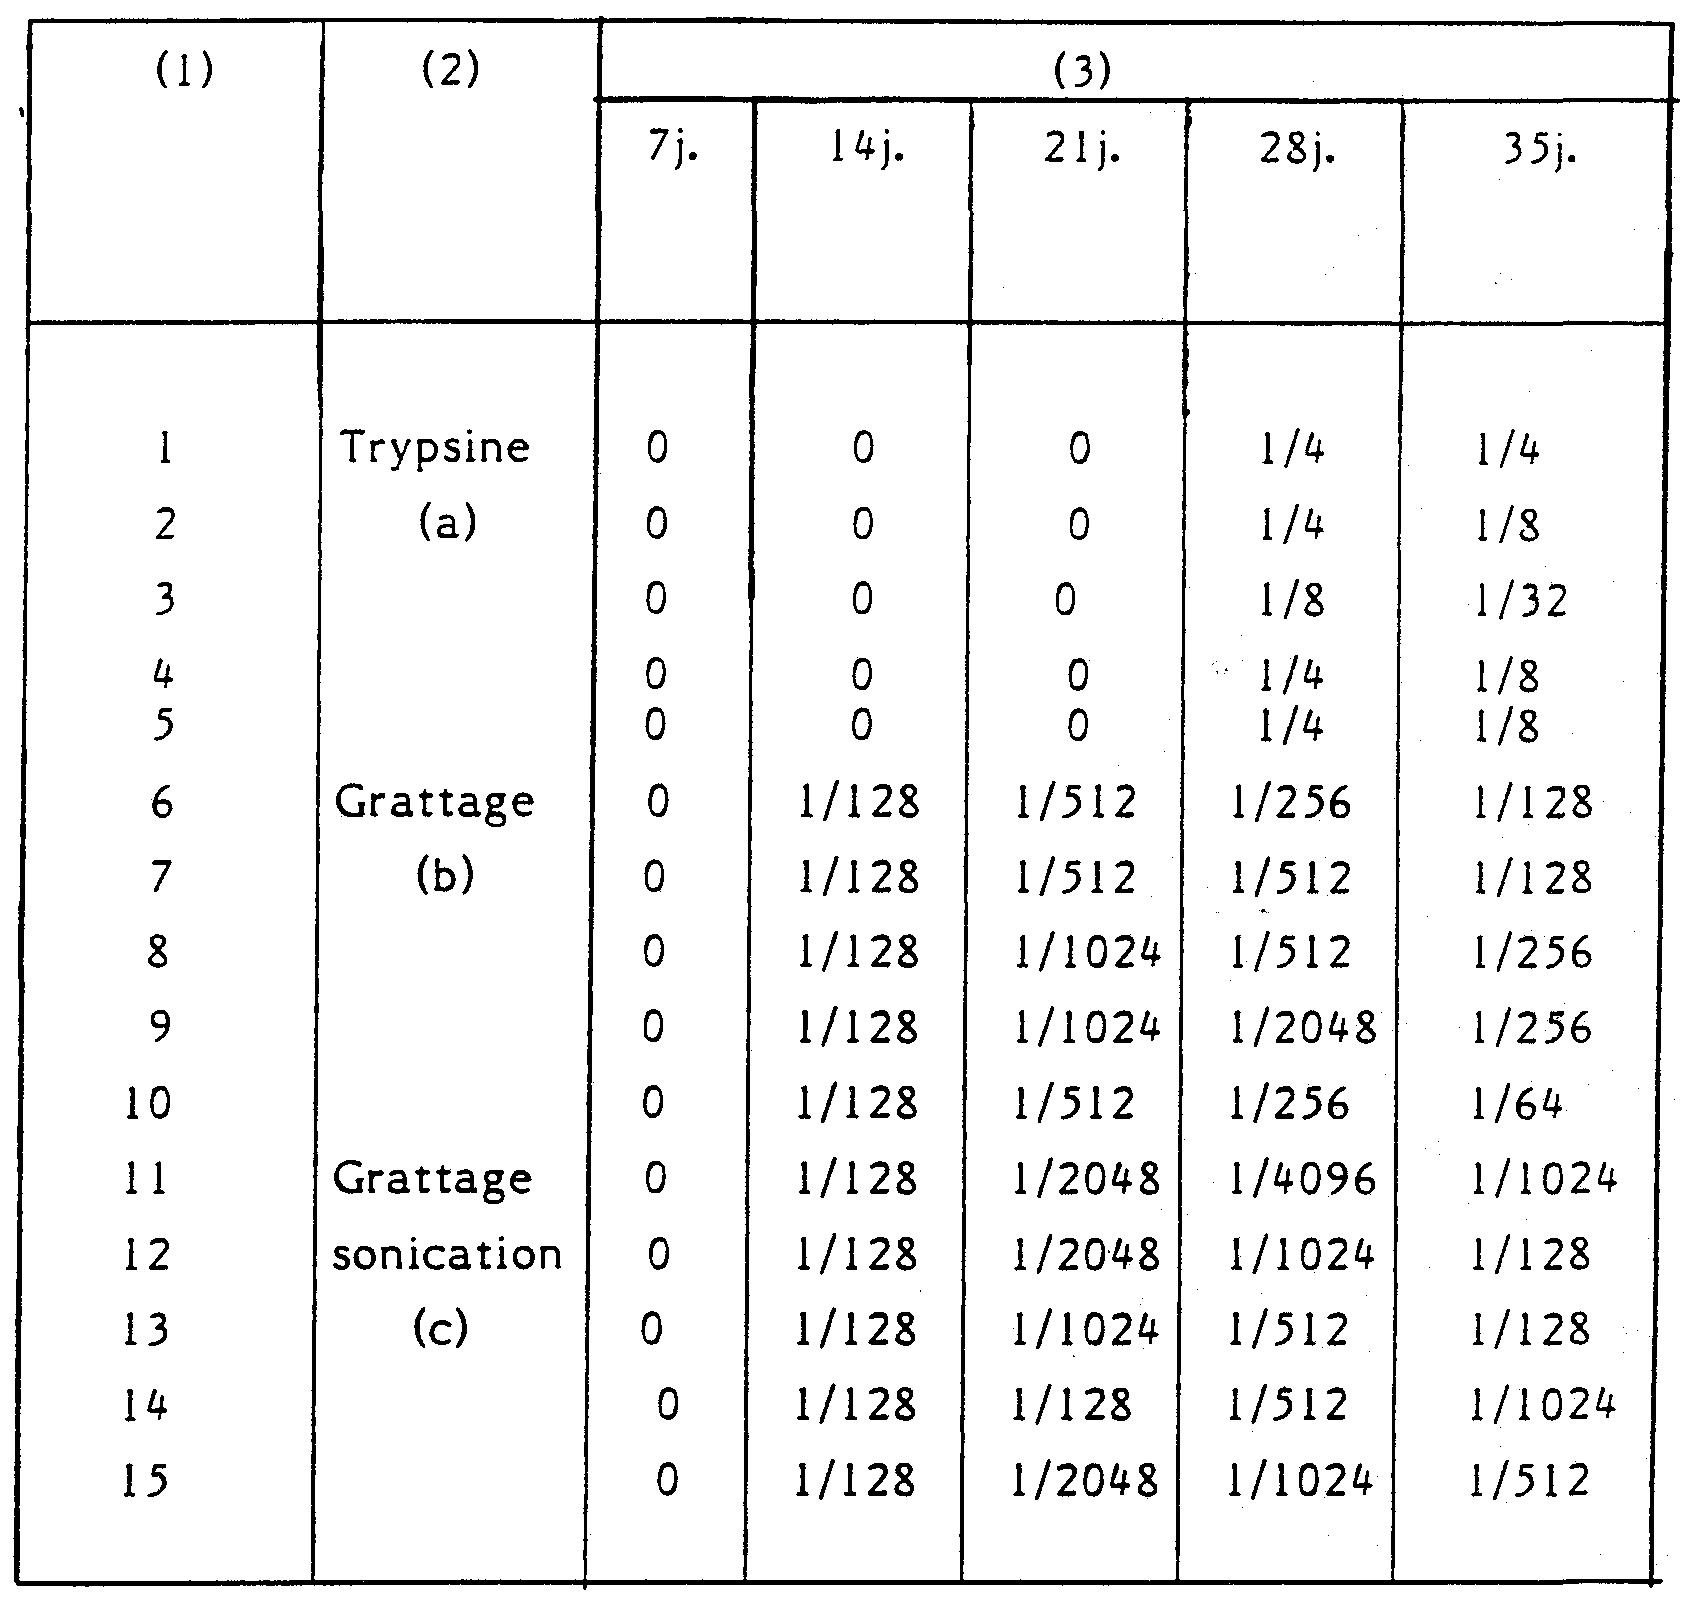 lisinopril benicar